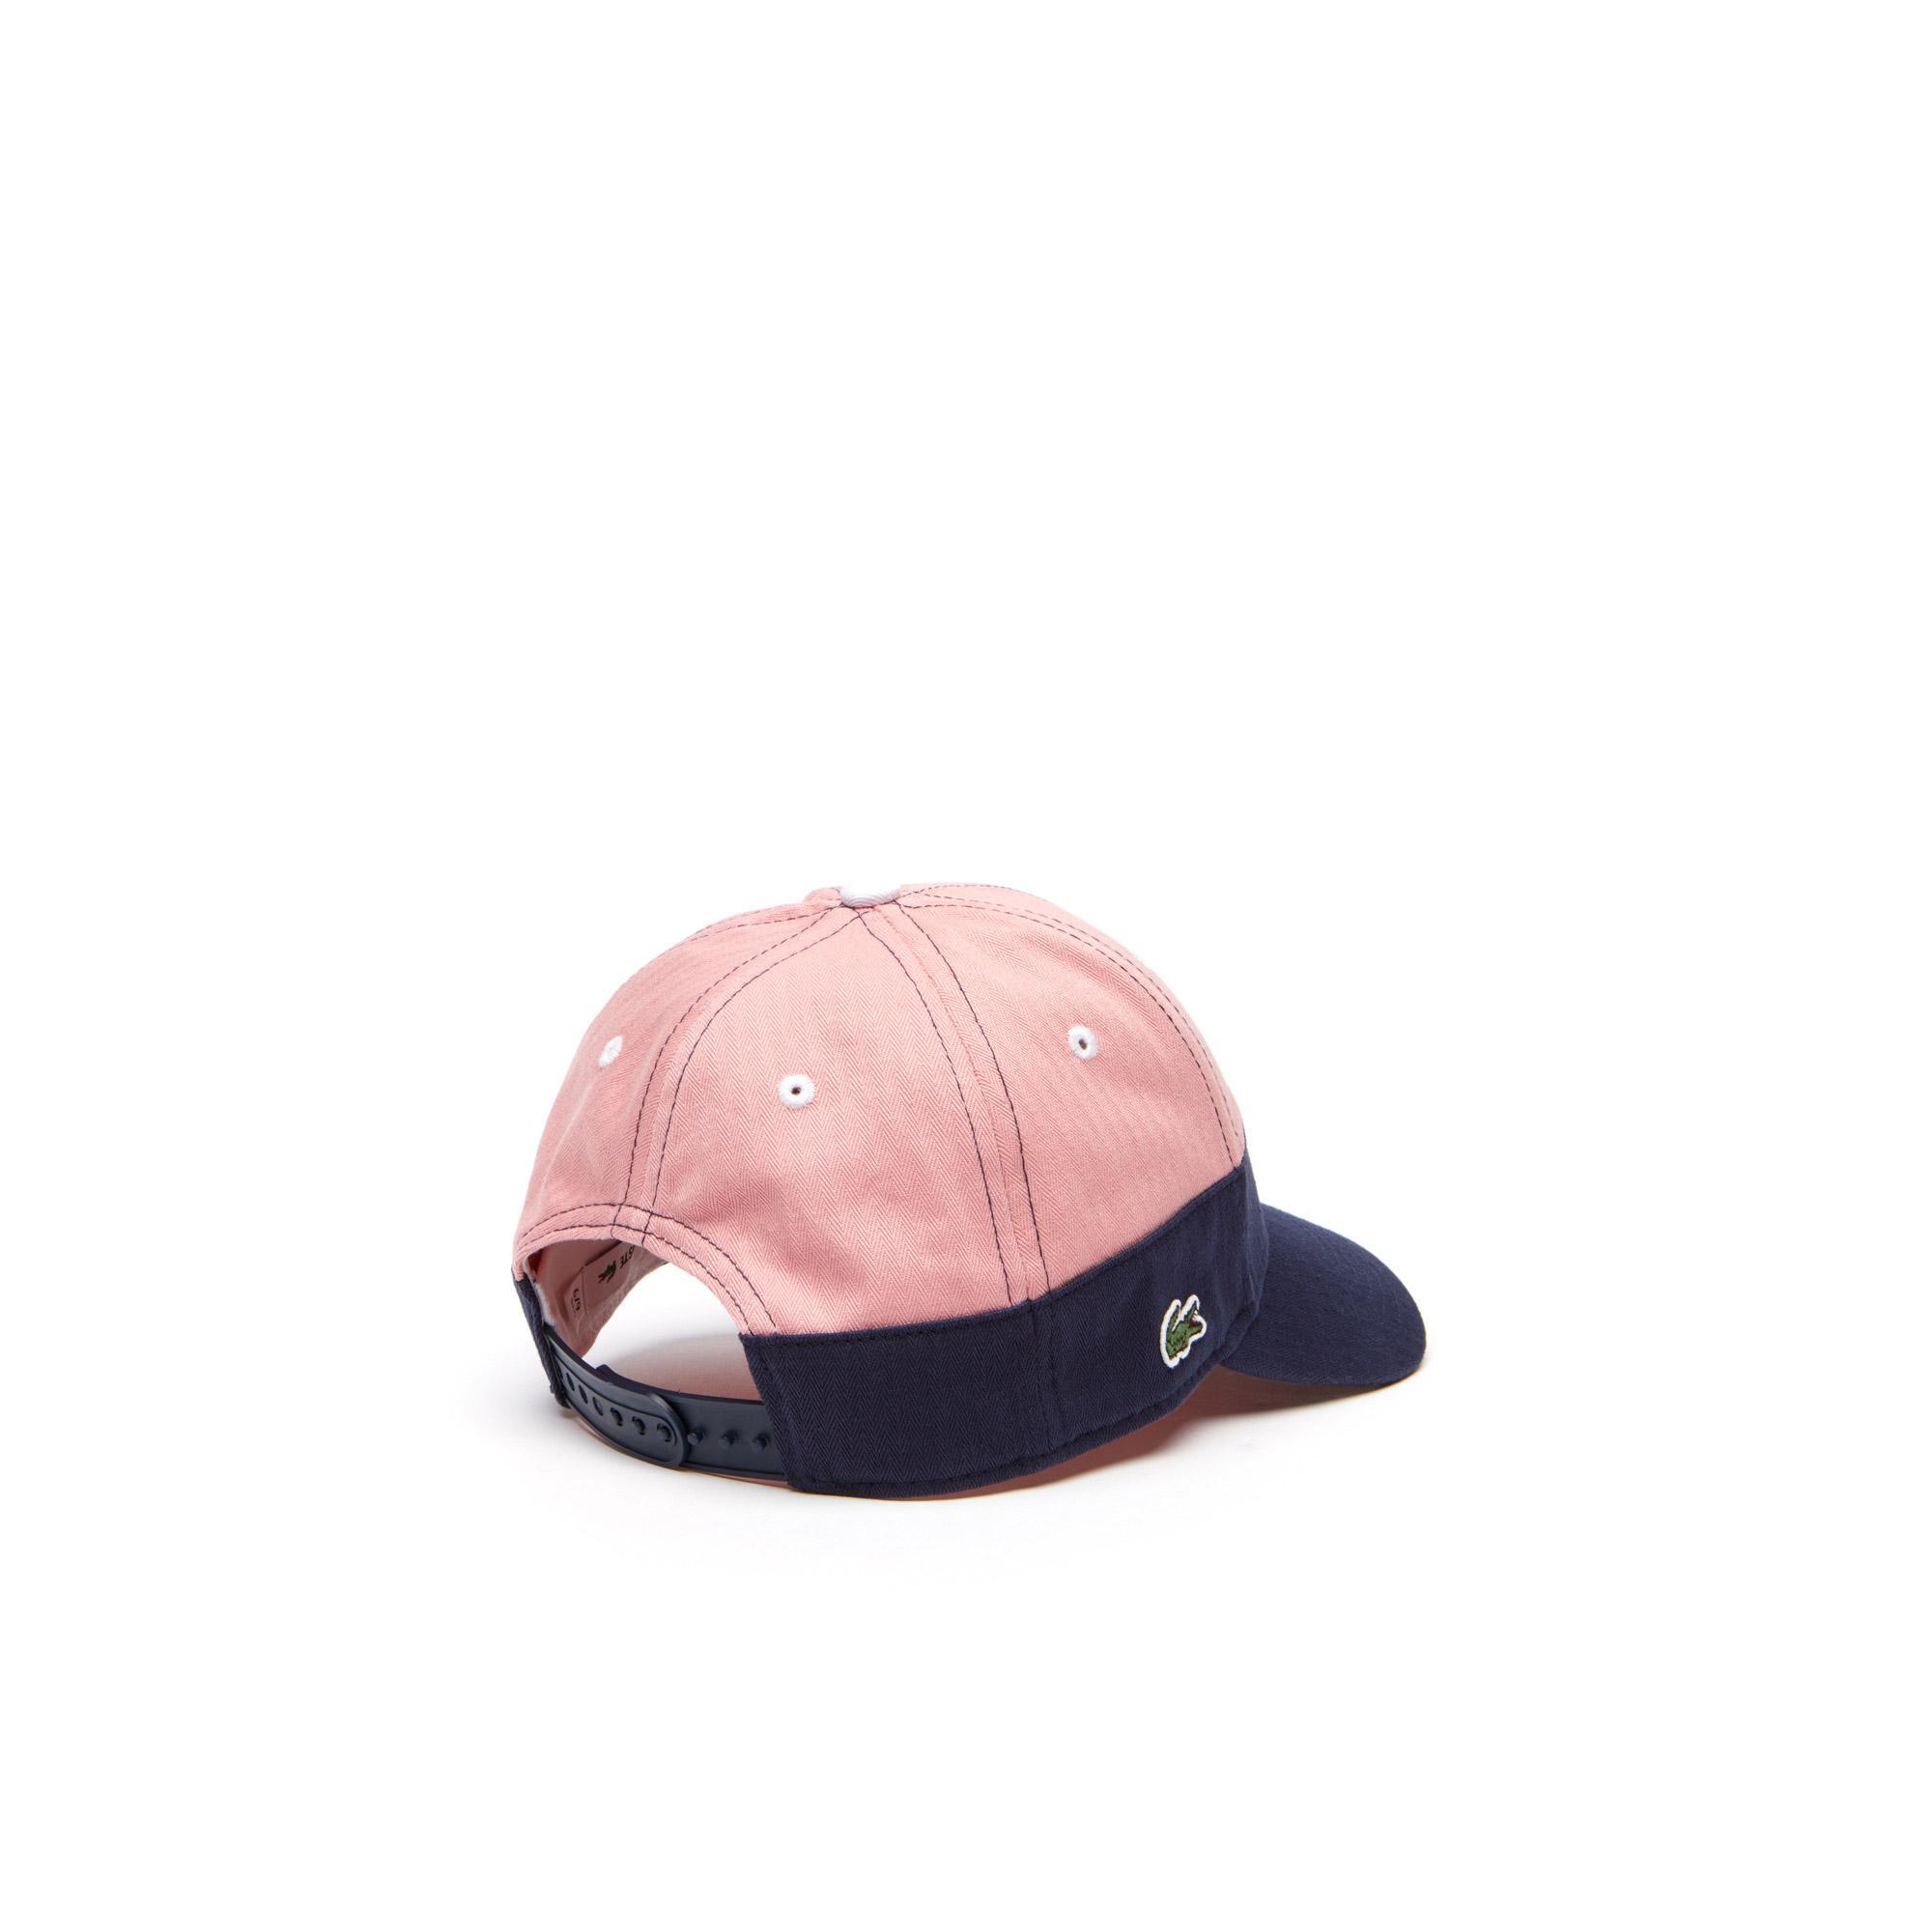 Lacoste Lacivert-Pembe Şapka